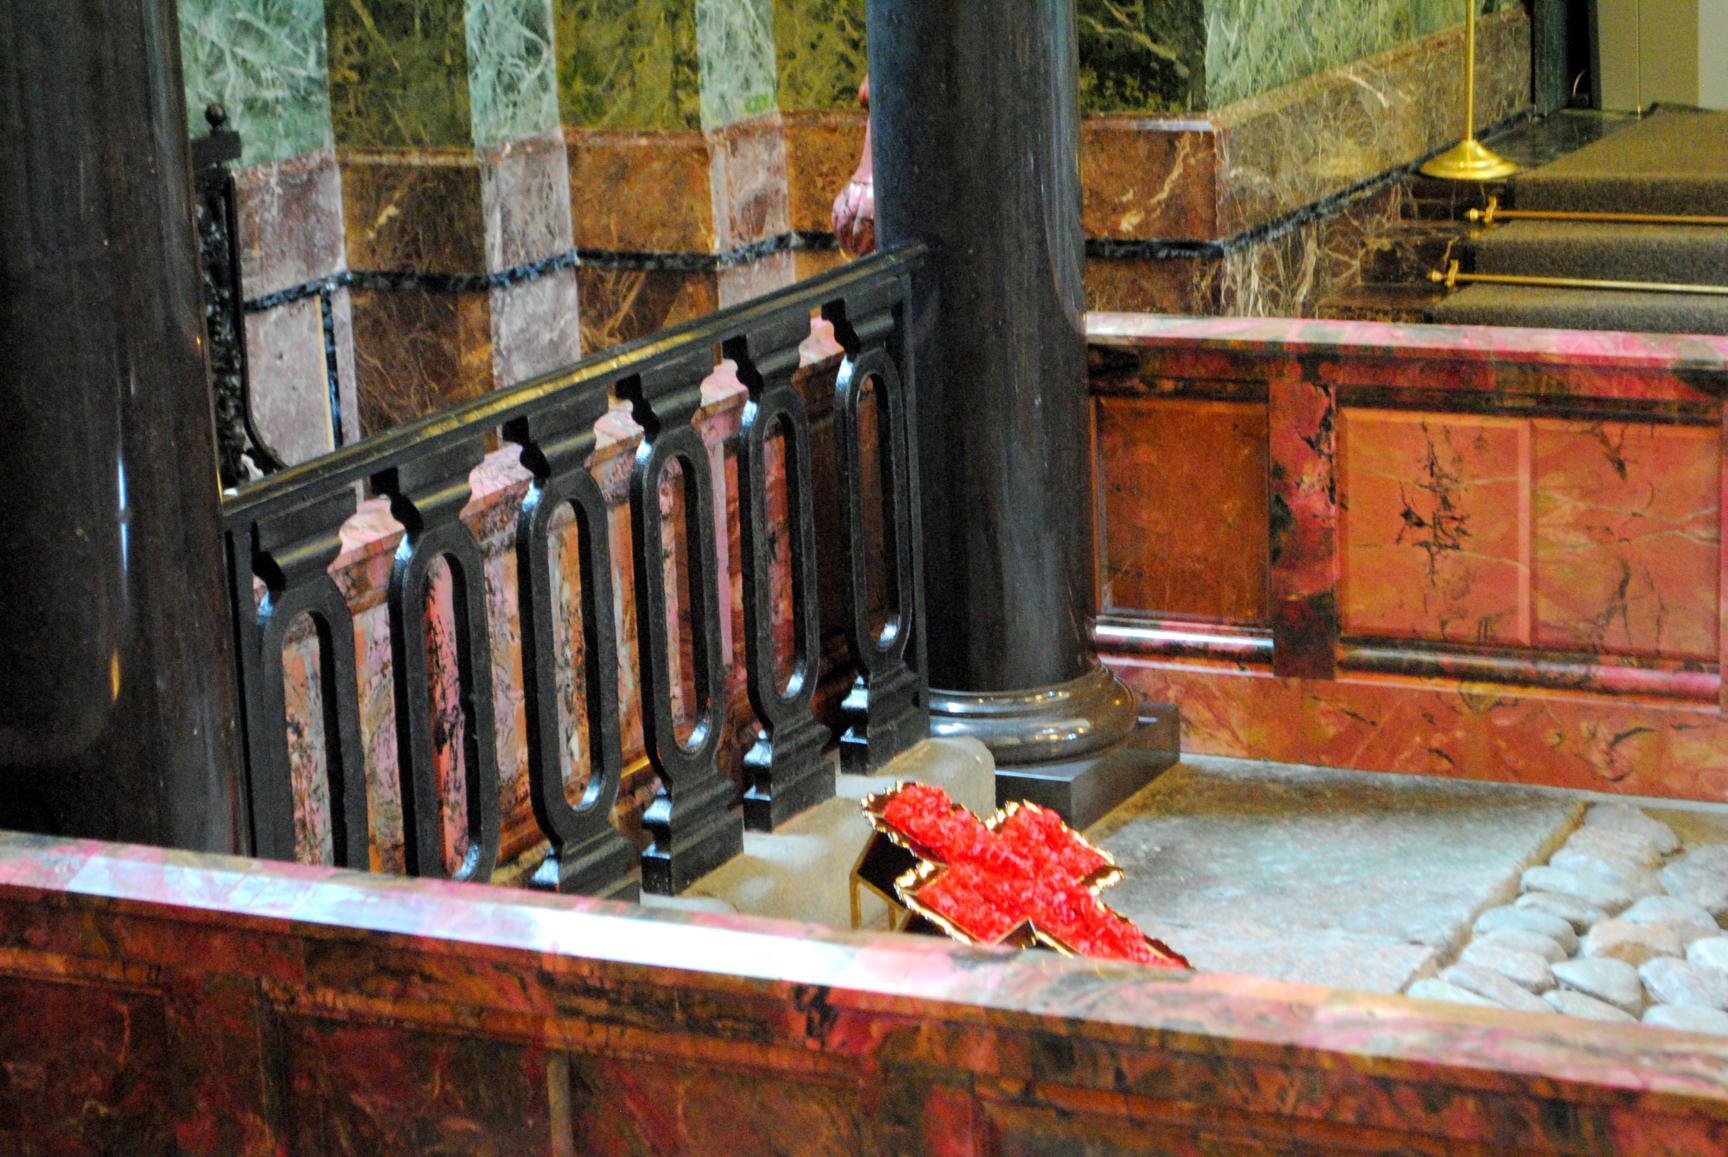 iglesia-sangre-derramada-interior